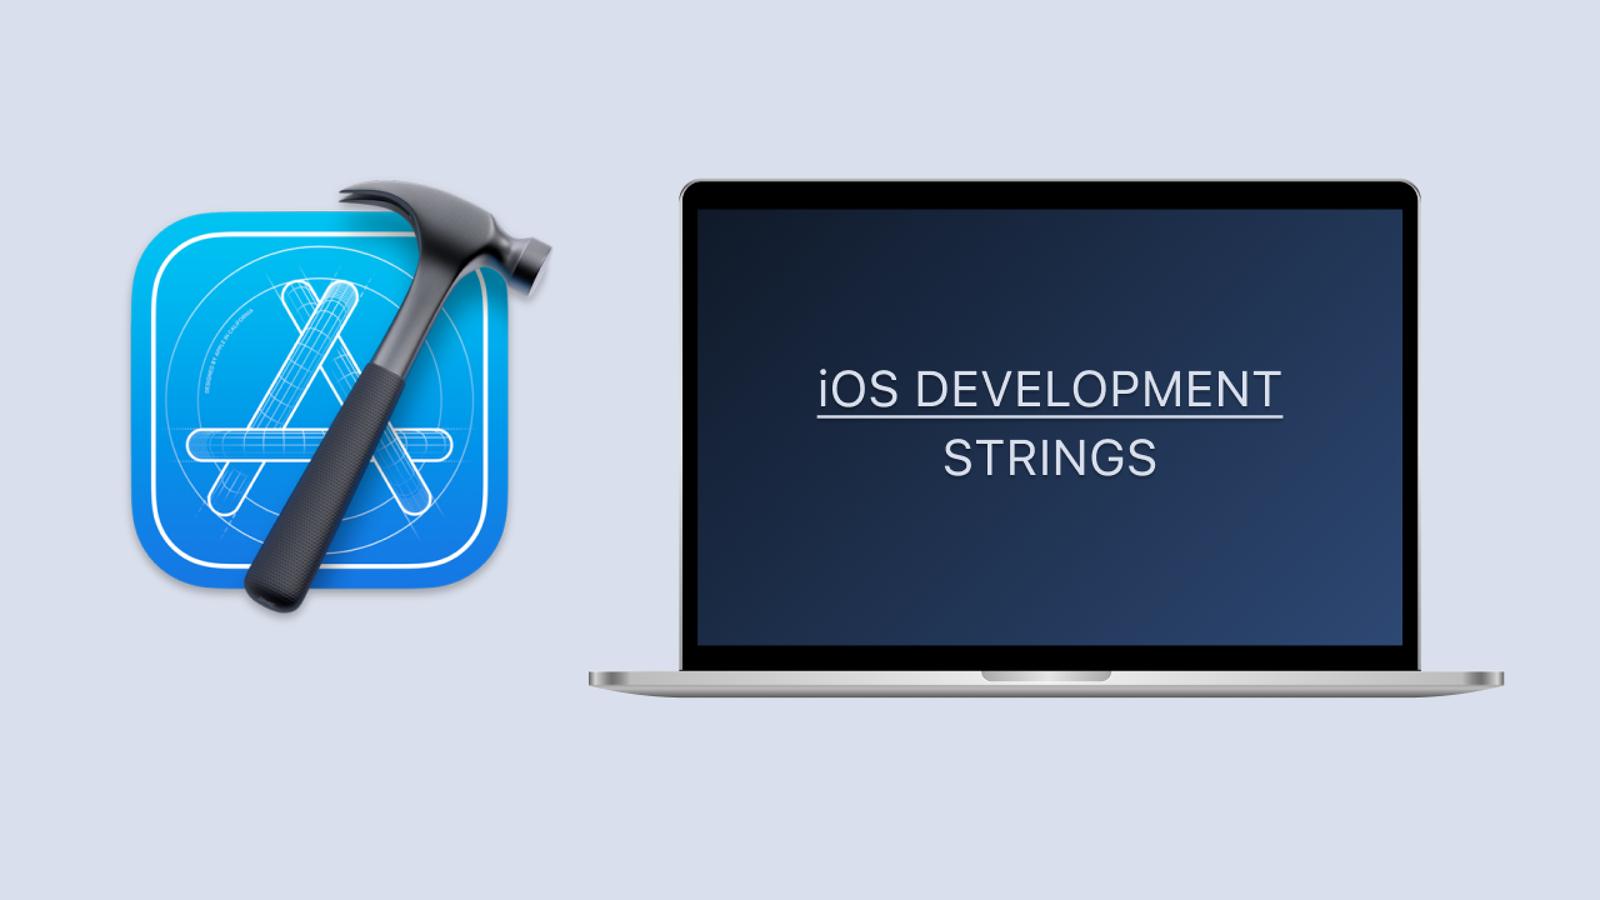 iOS Development #8: Strings